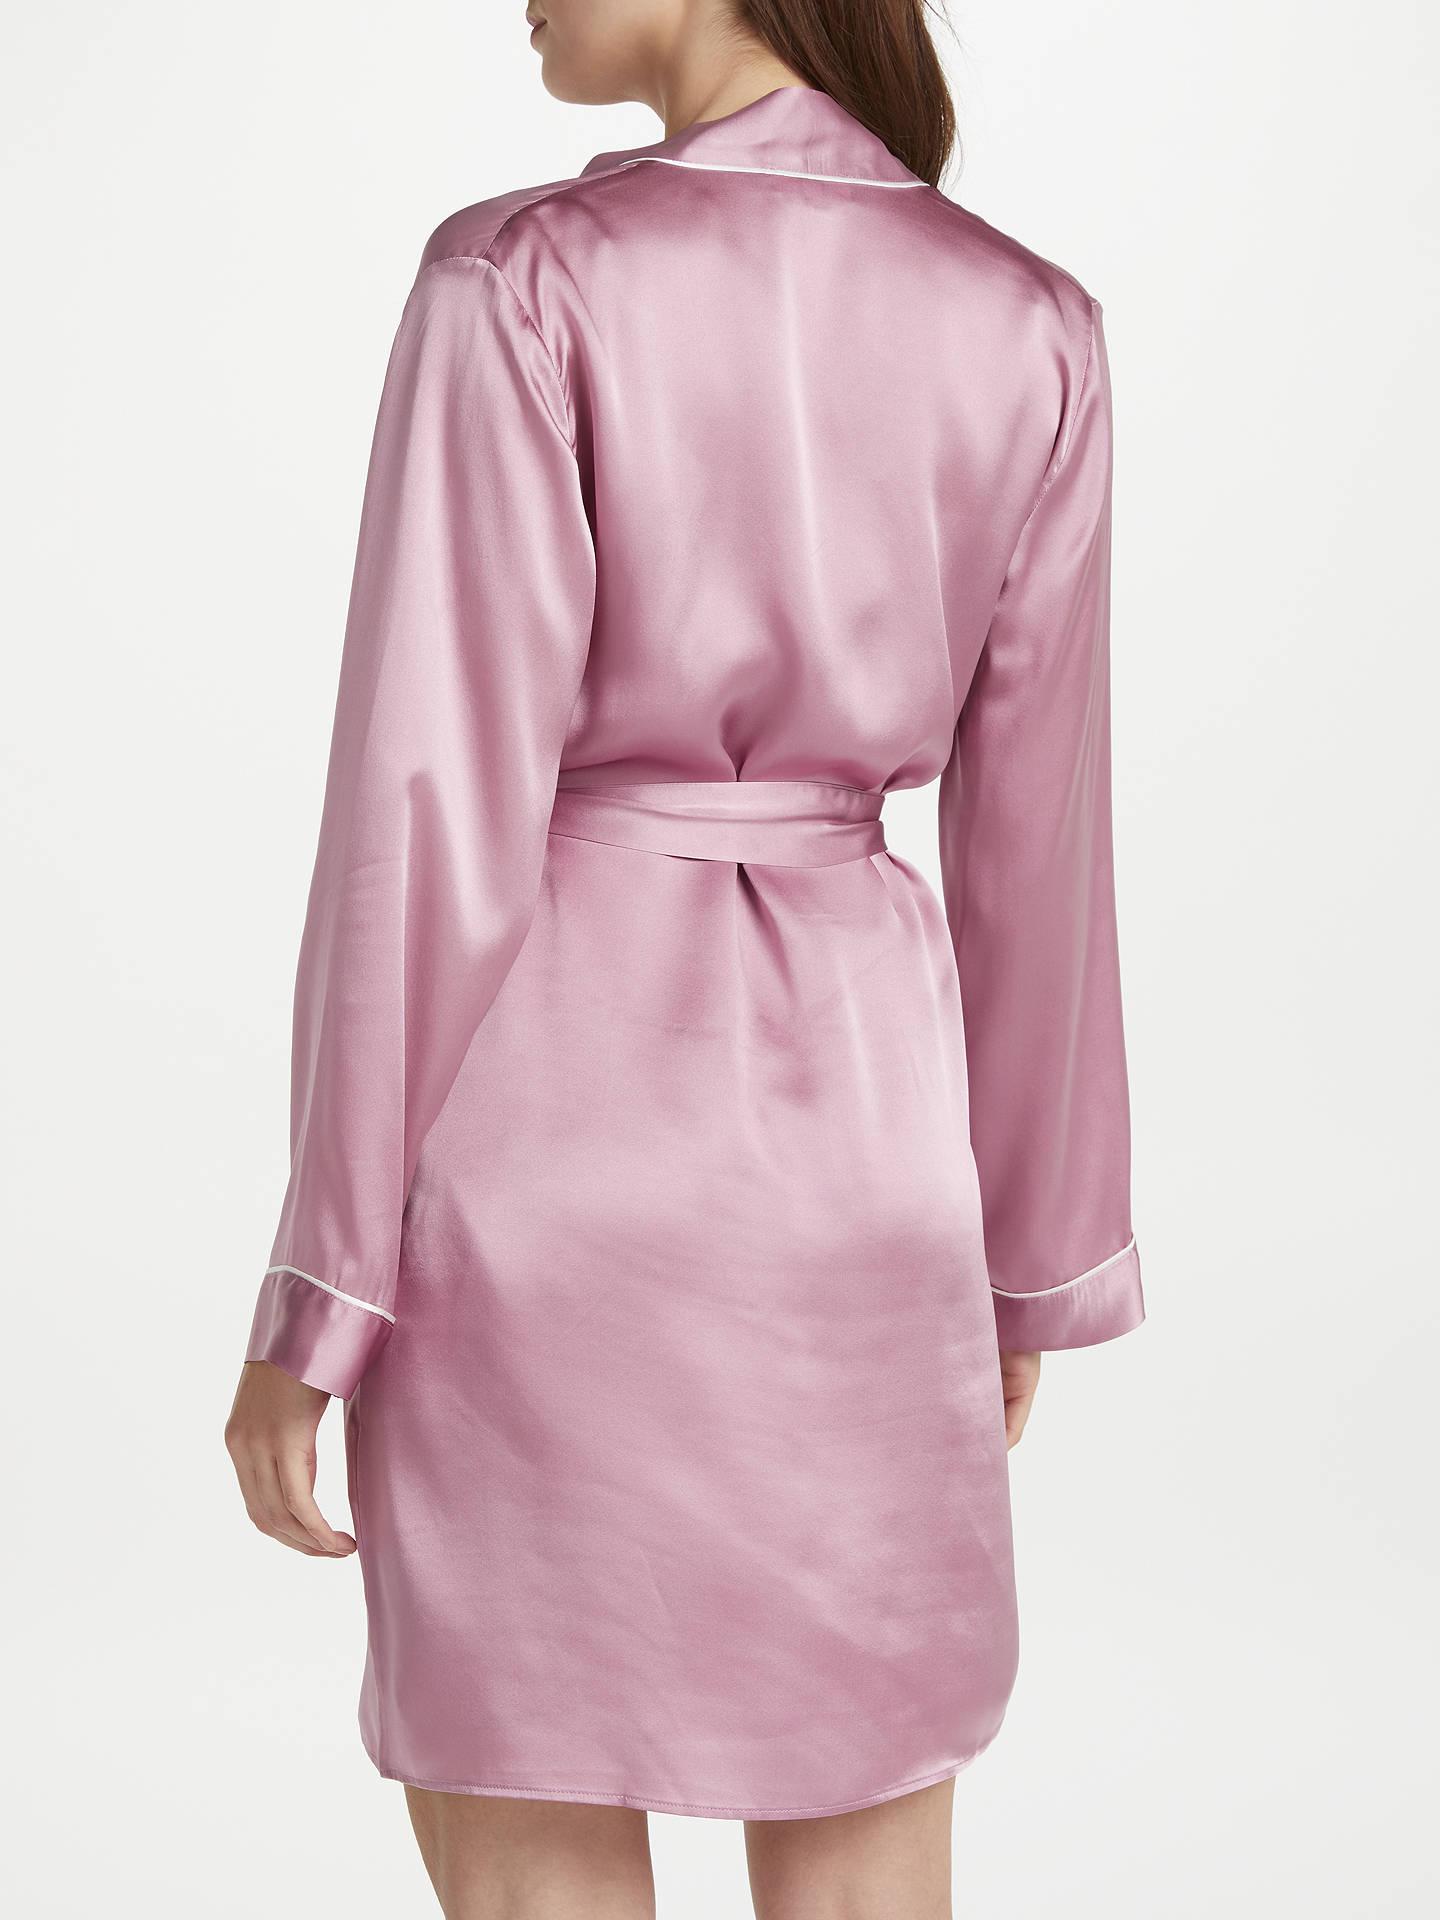 John Lewis Silk Dressing Gown, Mauve at John Lewis & Partners